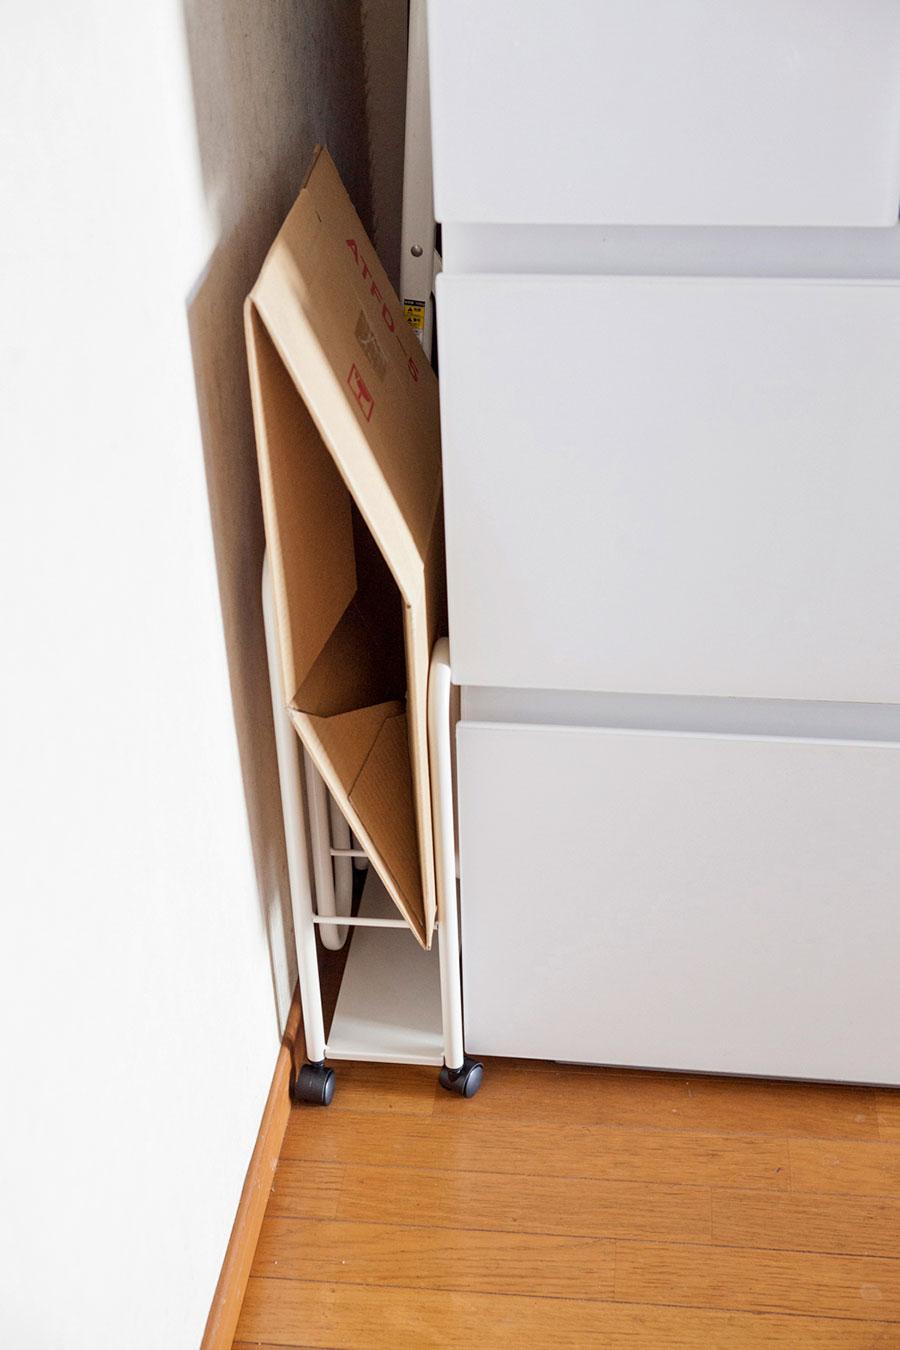 KEYUKAの「スリムにまとまるダンボールストッカー」を愛用。冷蔵庫横の隙間にぴったり入り、保管場所に困る段ボールを仮置きしておける。